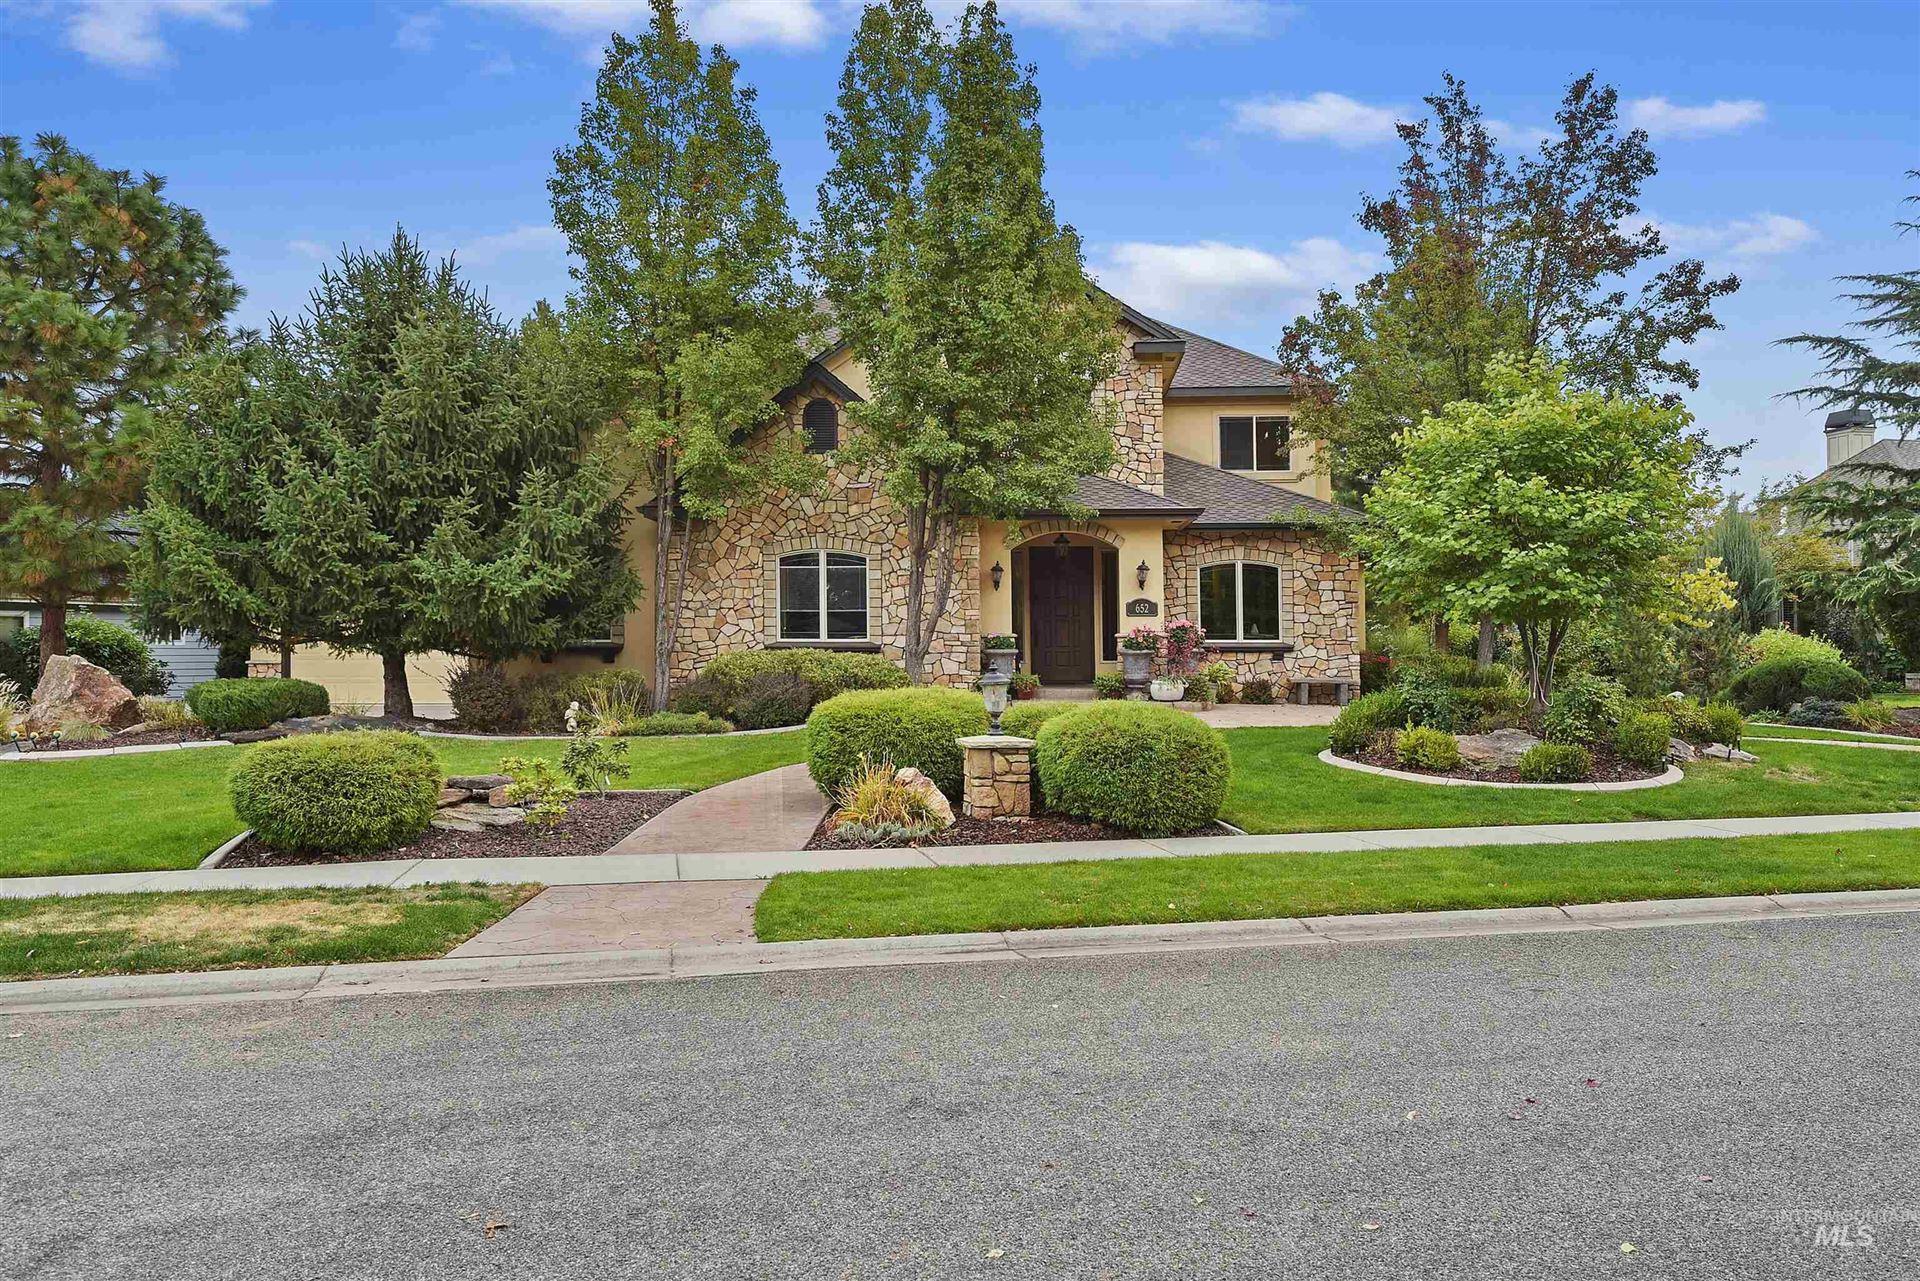 652 W Water Grove, Eagle, ID 83616 - MLS#: 98822079